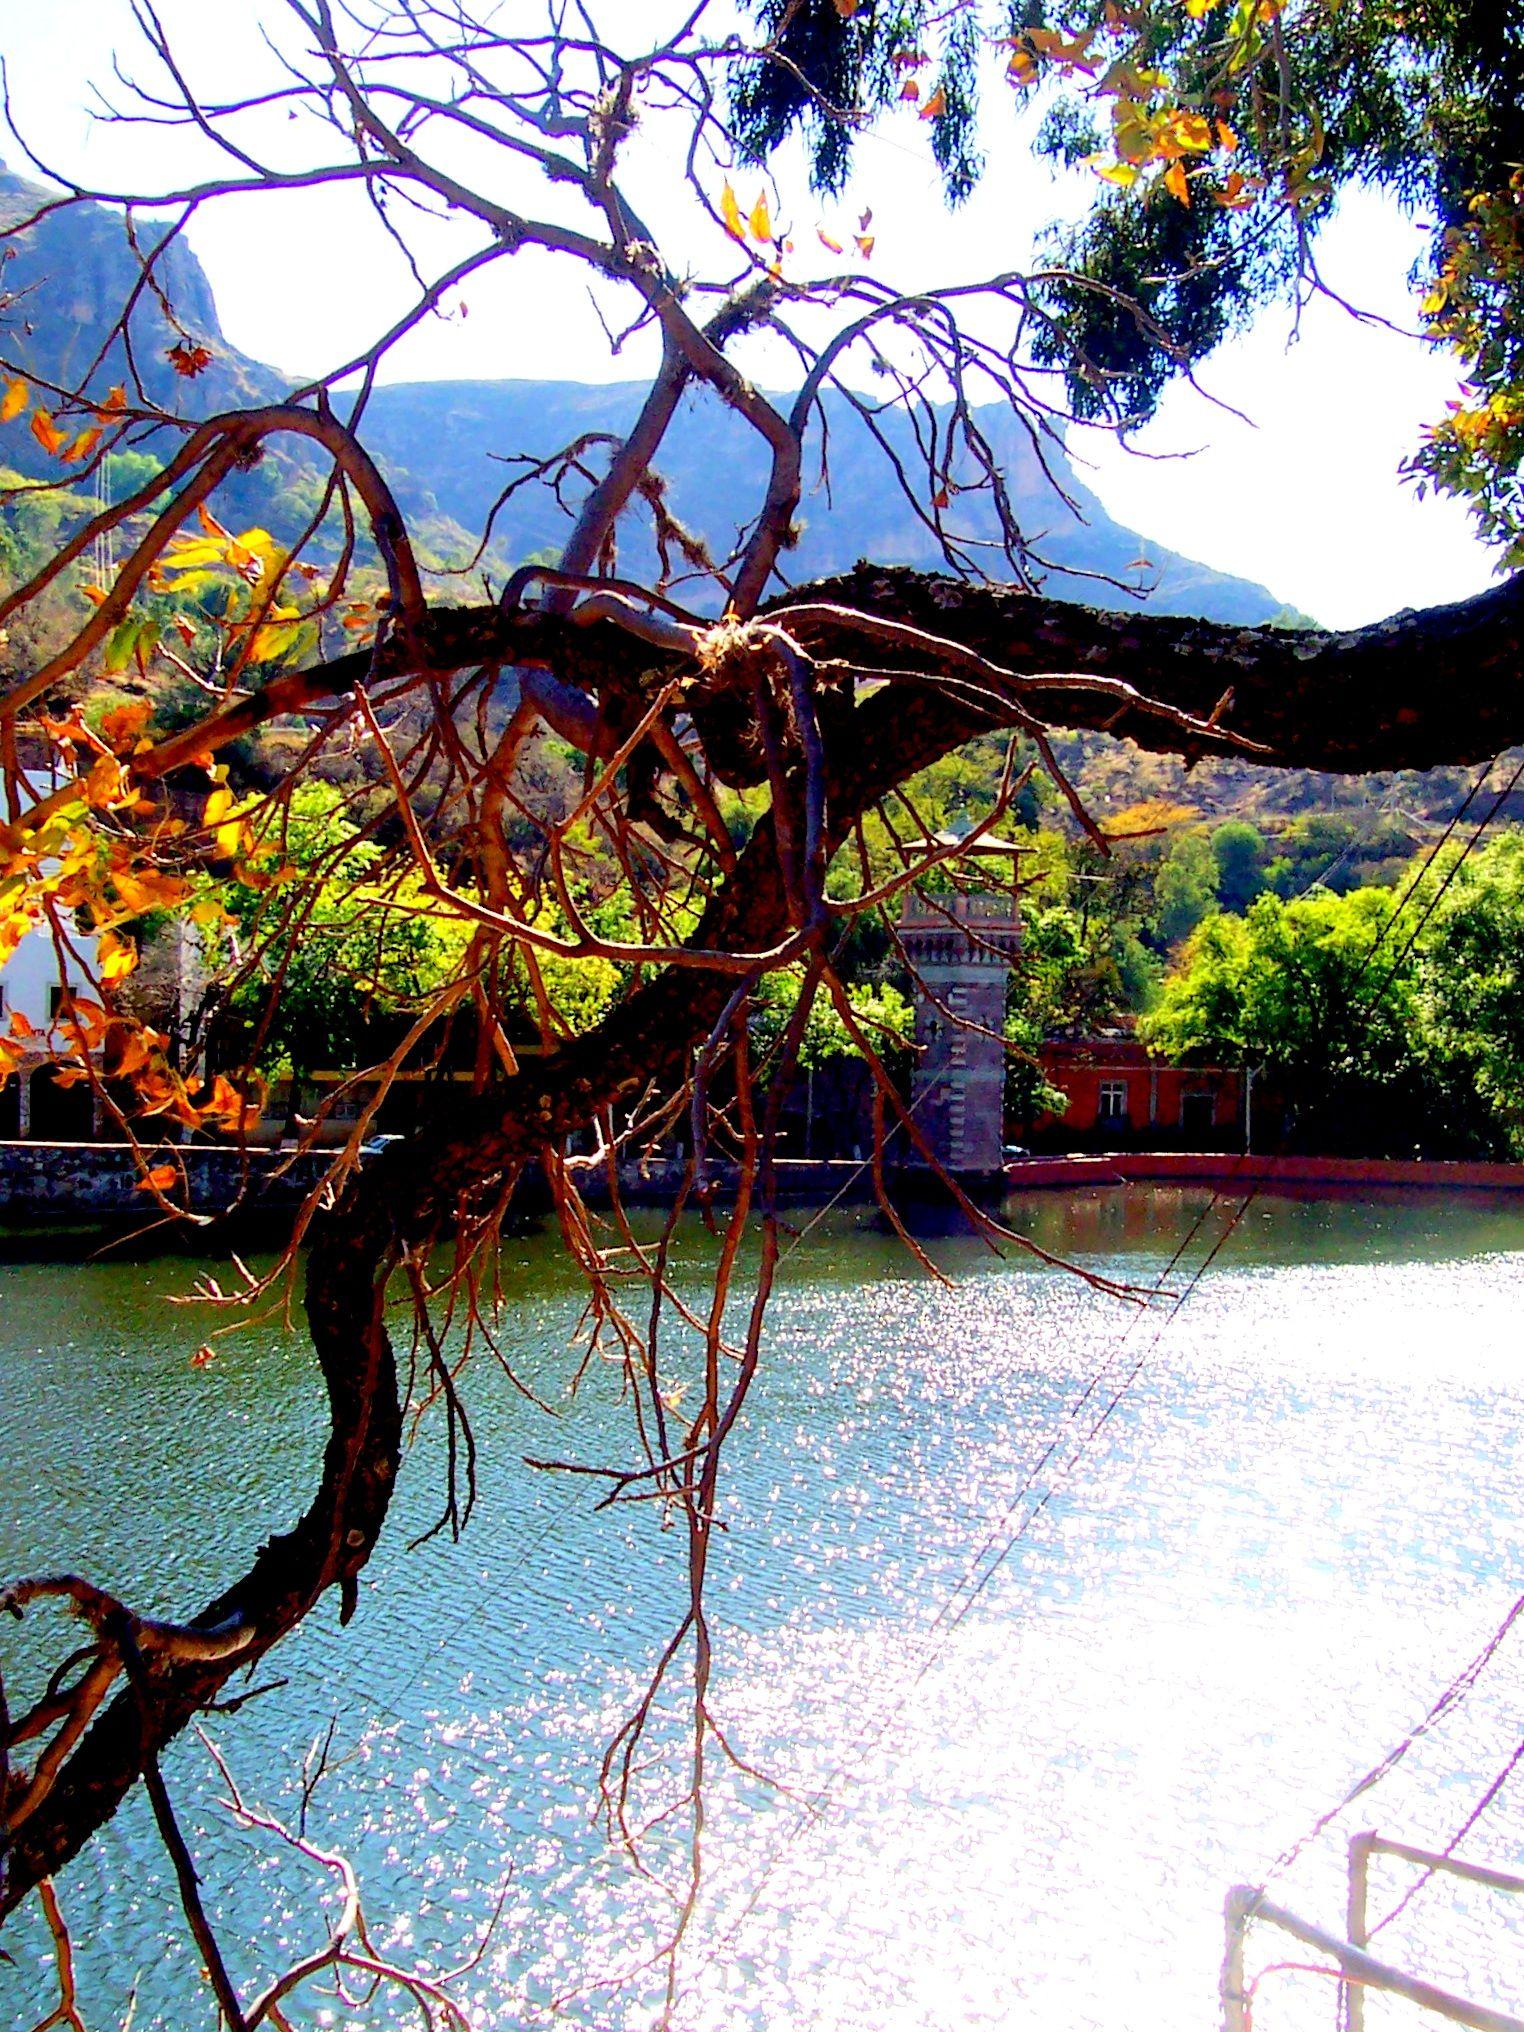 Presa Guanajuato Mexico Beautiful Lakes River Lake